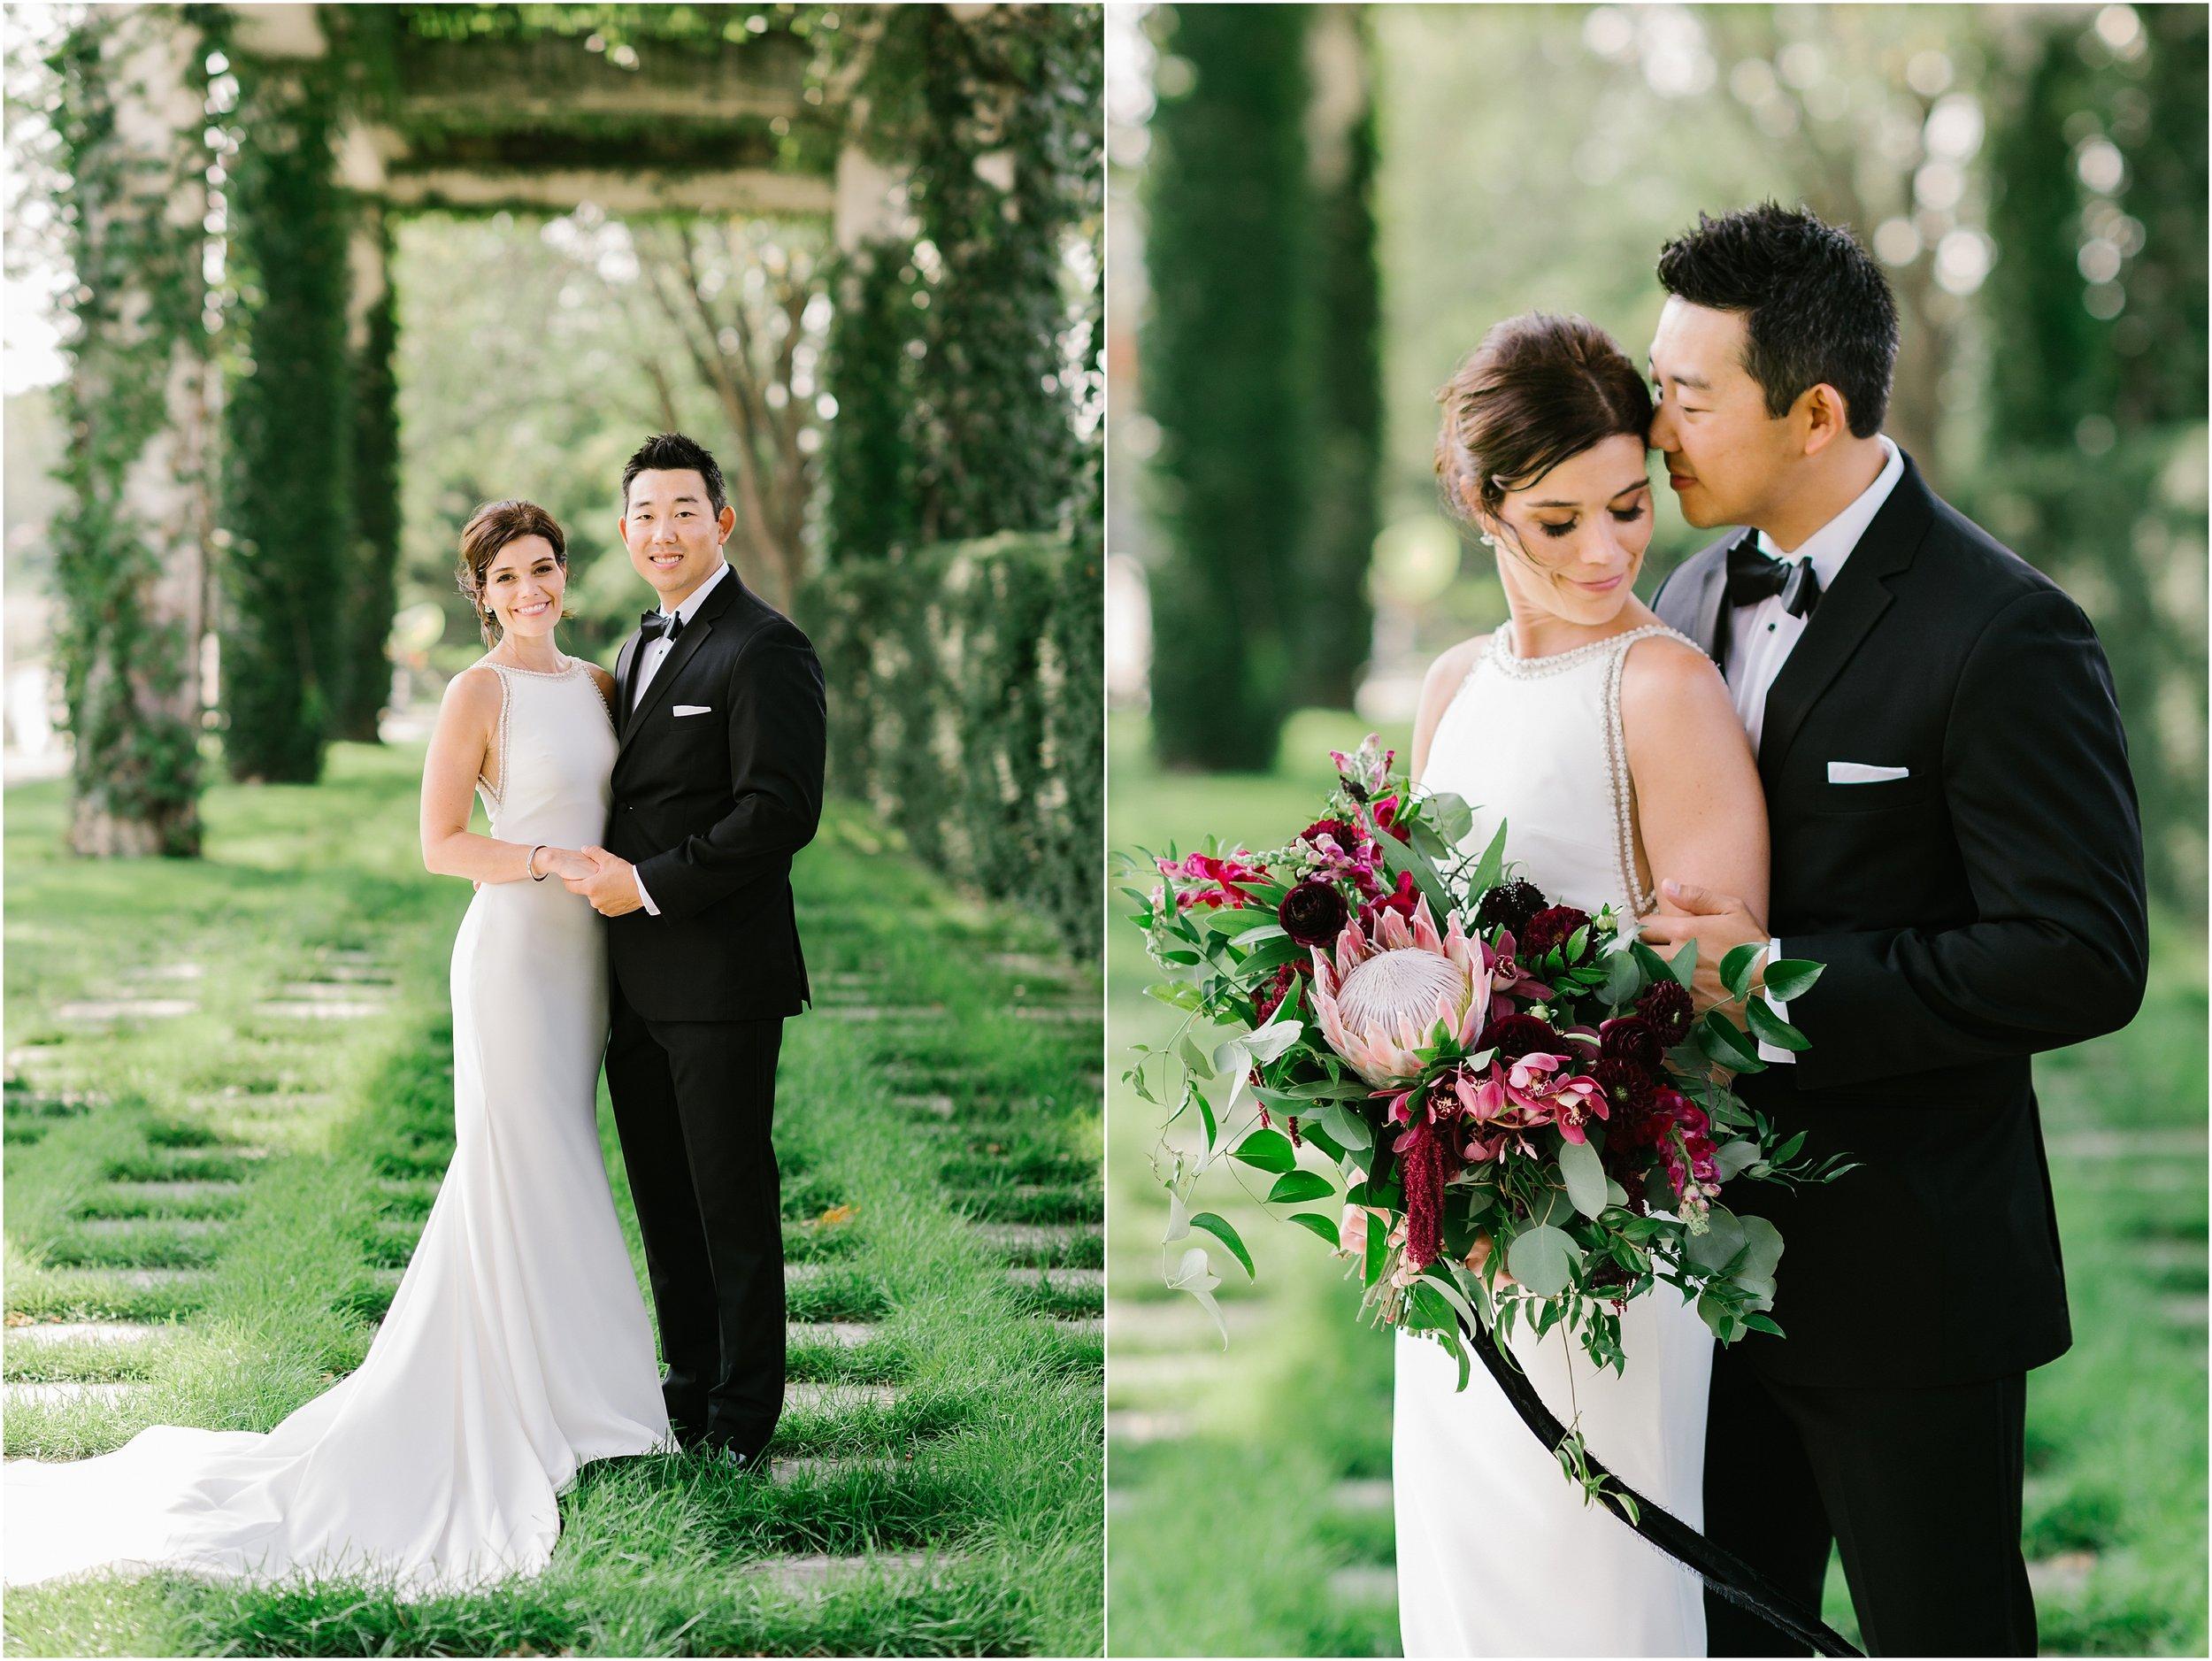 Rebecca_Shehorn_Photography_Indianapolis Wedding Photographer Sycamore at Mallow Run Wedding_9745.jpg